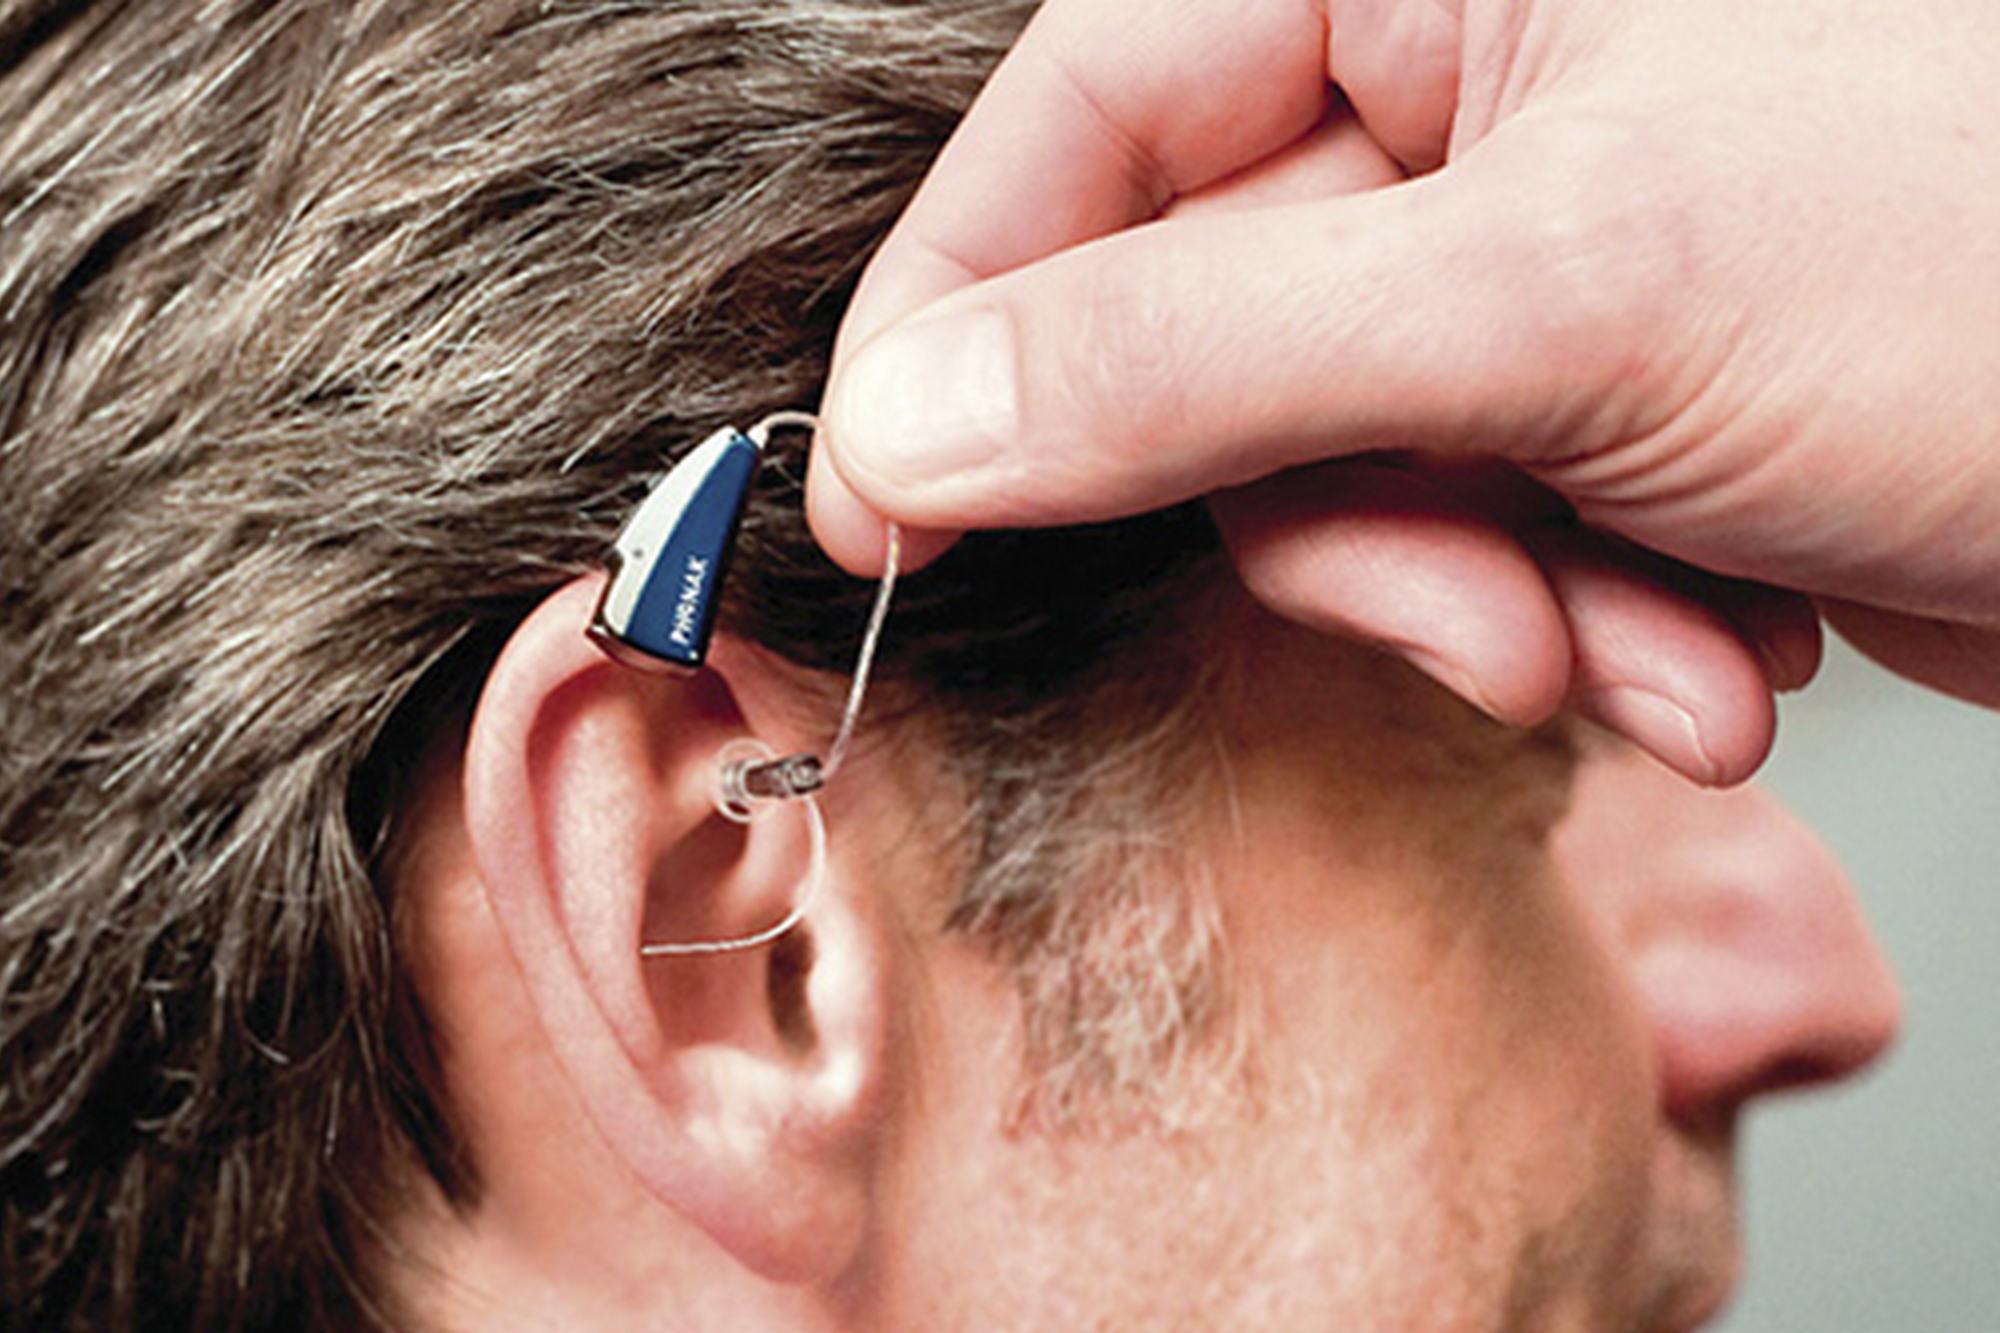 Как произвести правильную настройку слухового аппарата